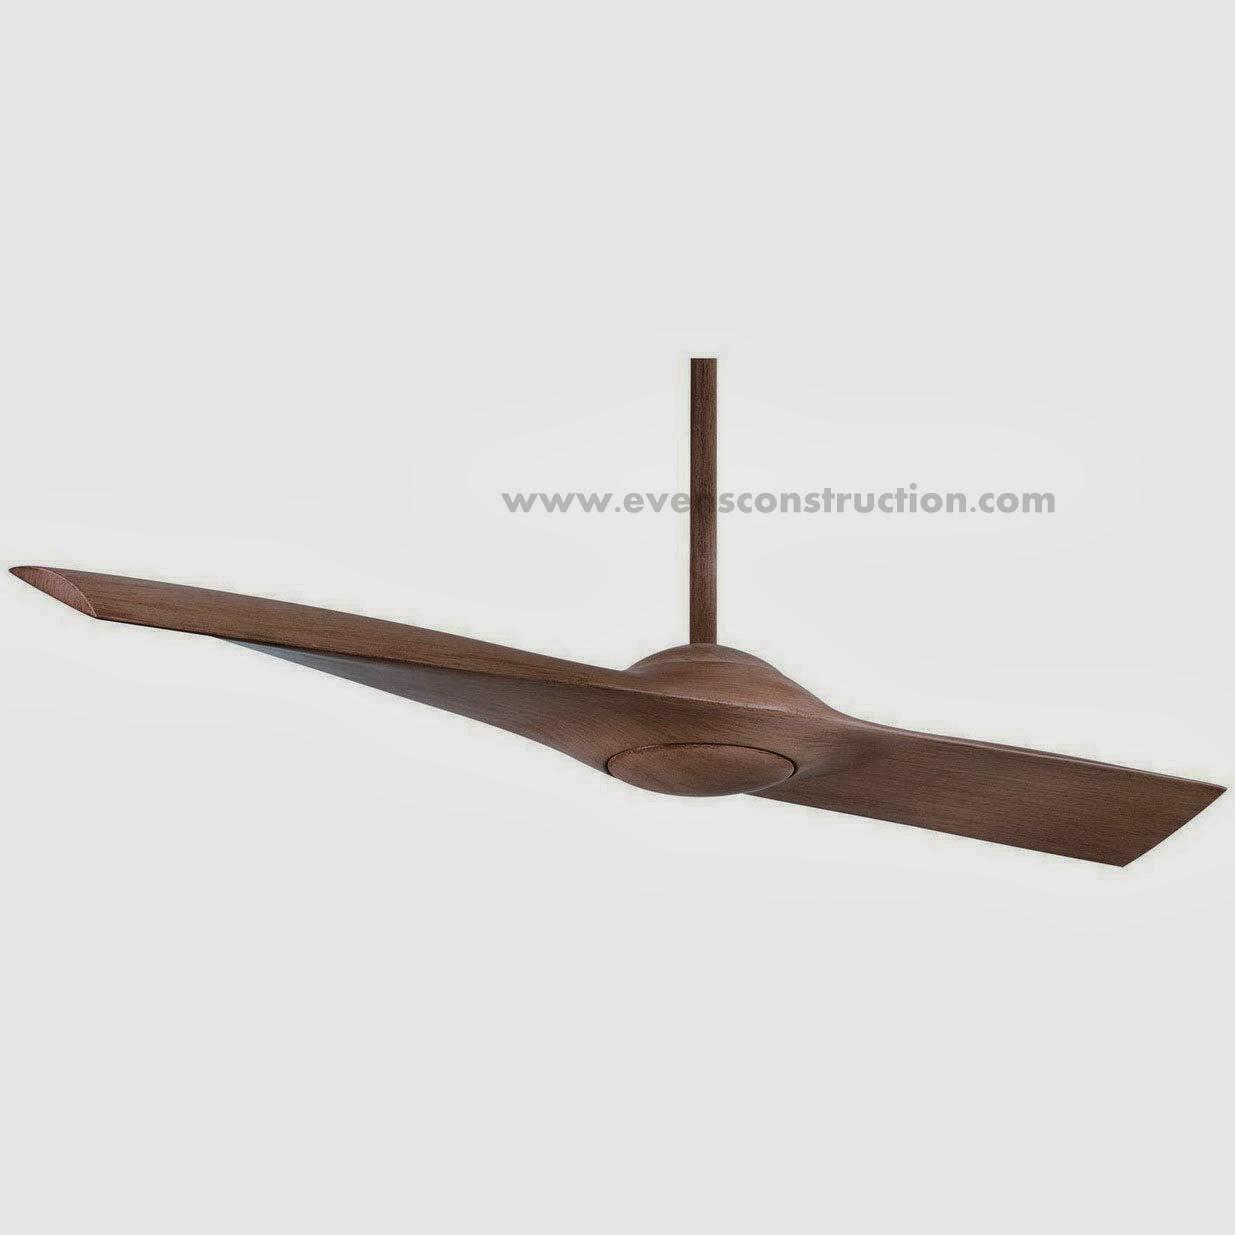 Evens construction pvt ltd modern ceiling fan designs